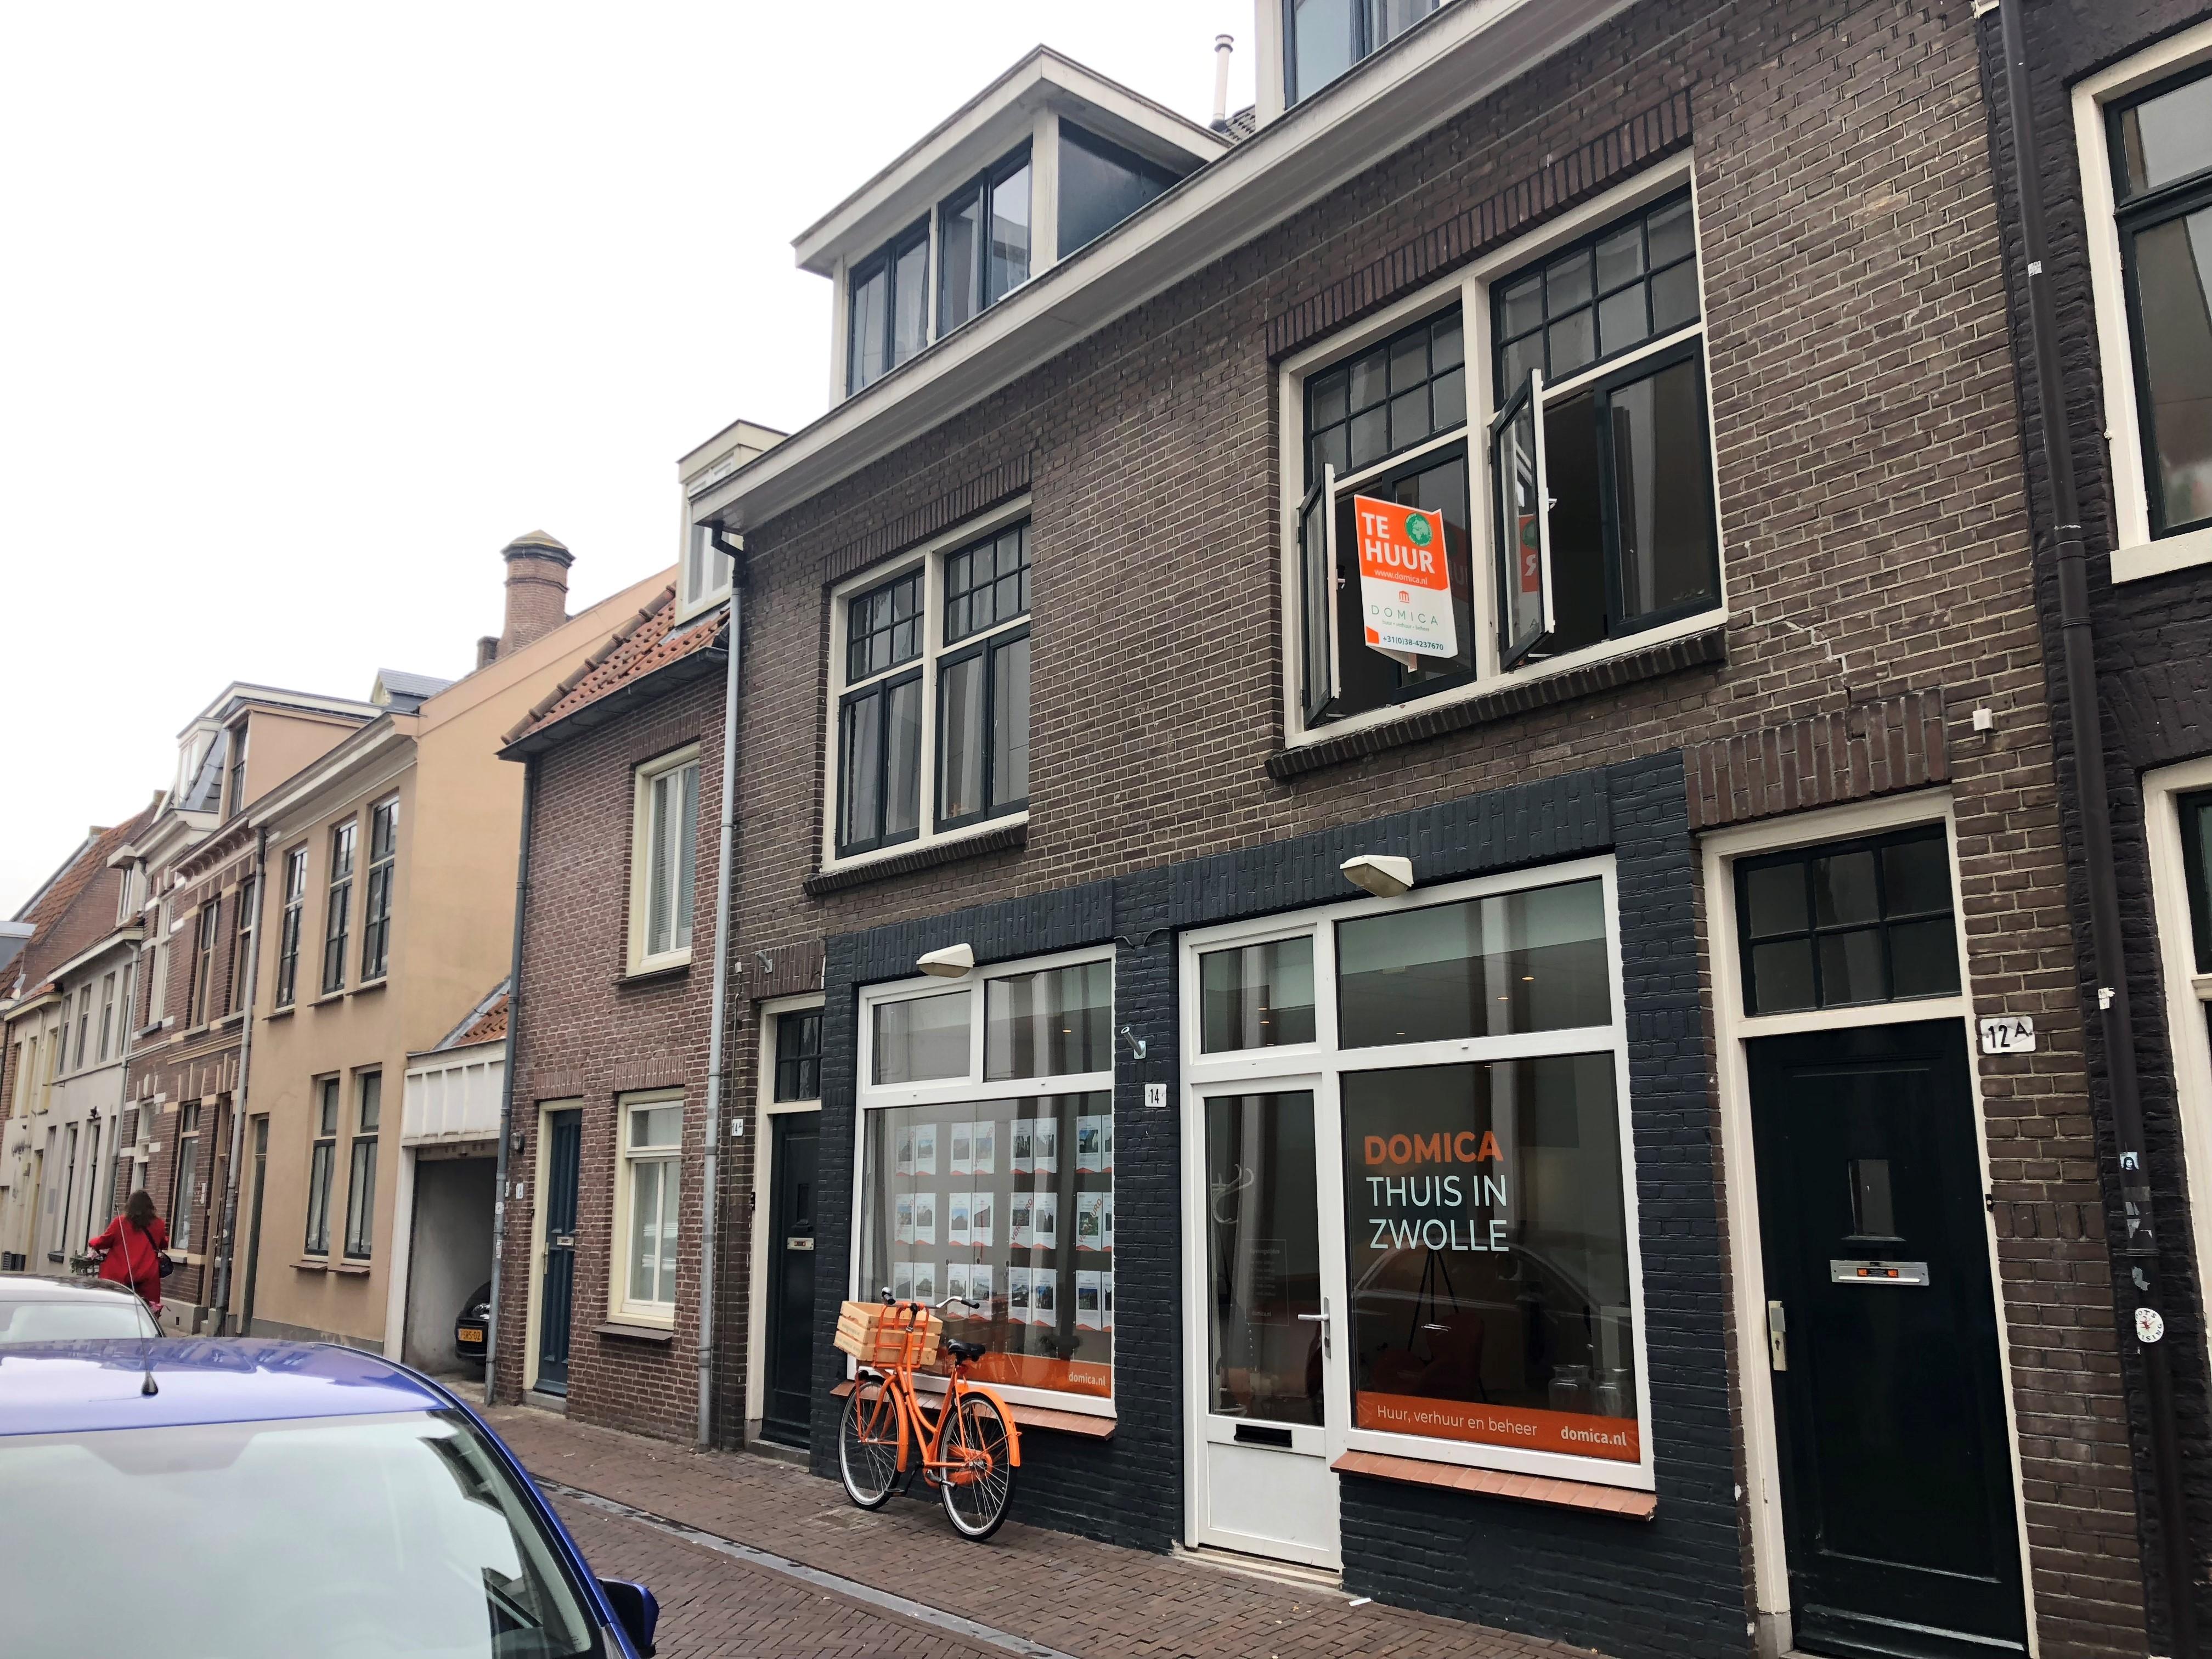 Kamer te huur in de Spoelstraat in Zwolle